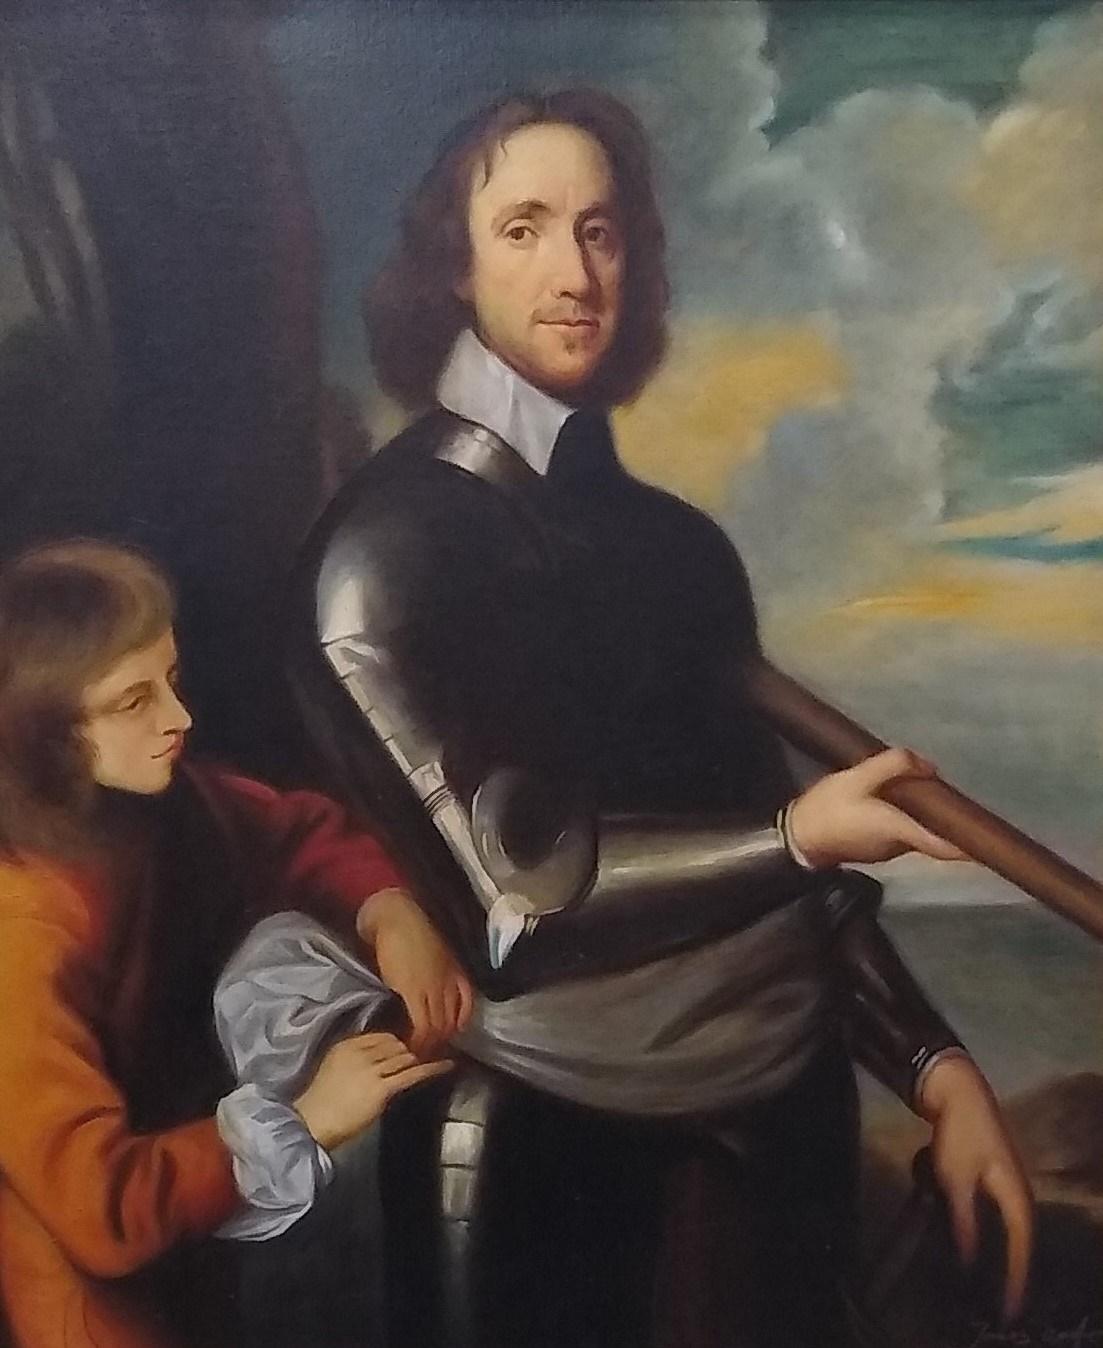 Oliver Cromwell halls fine art